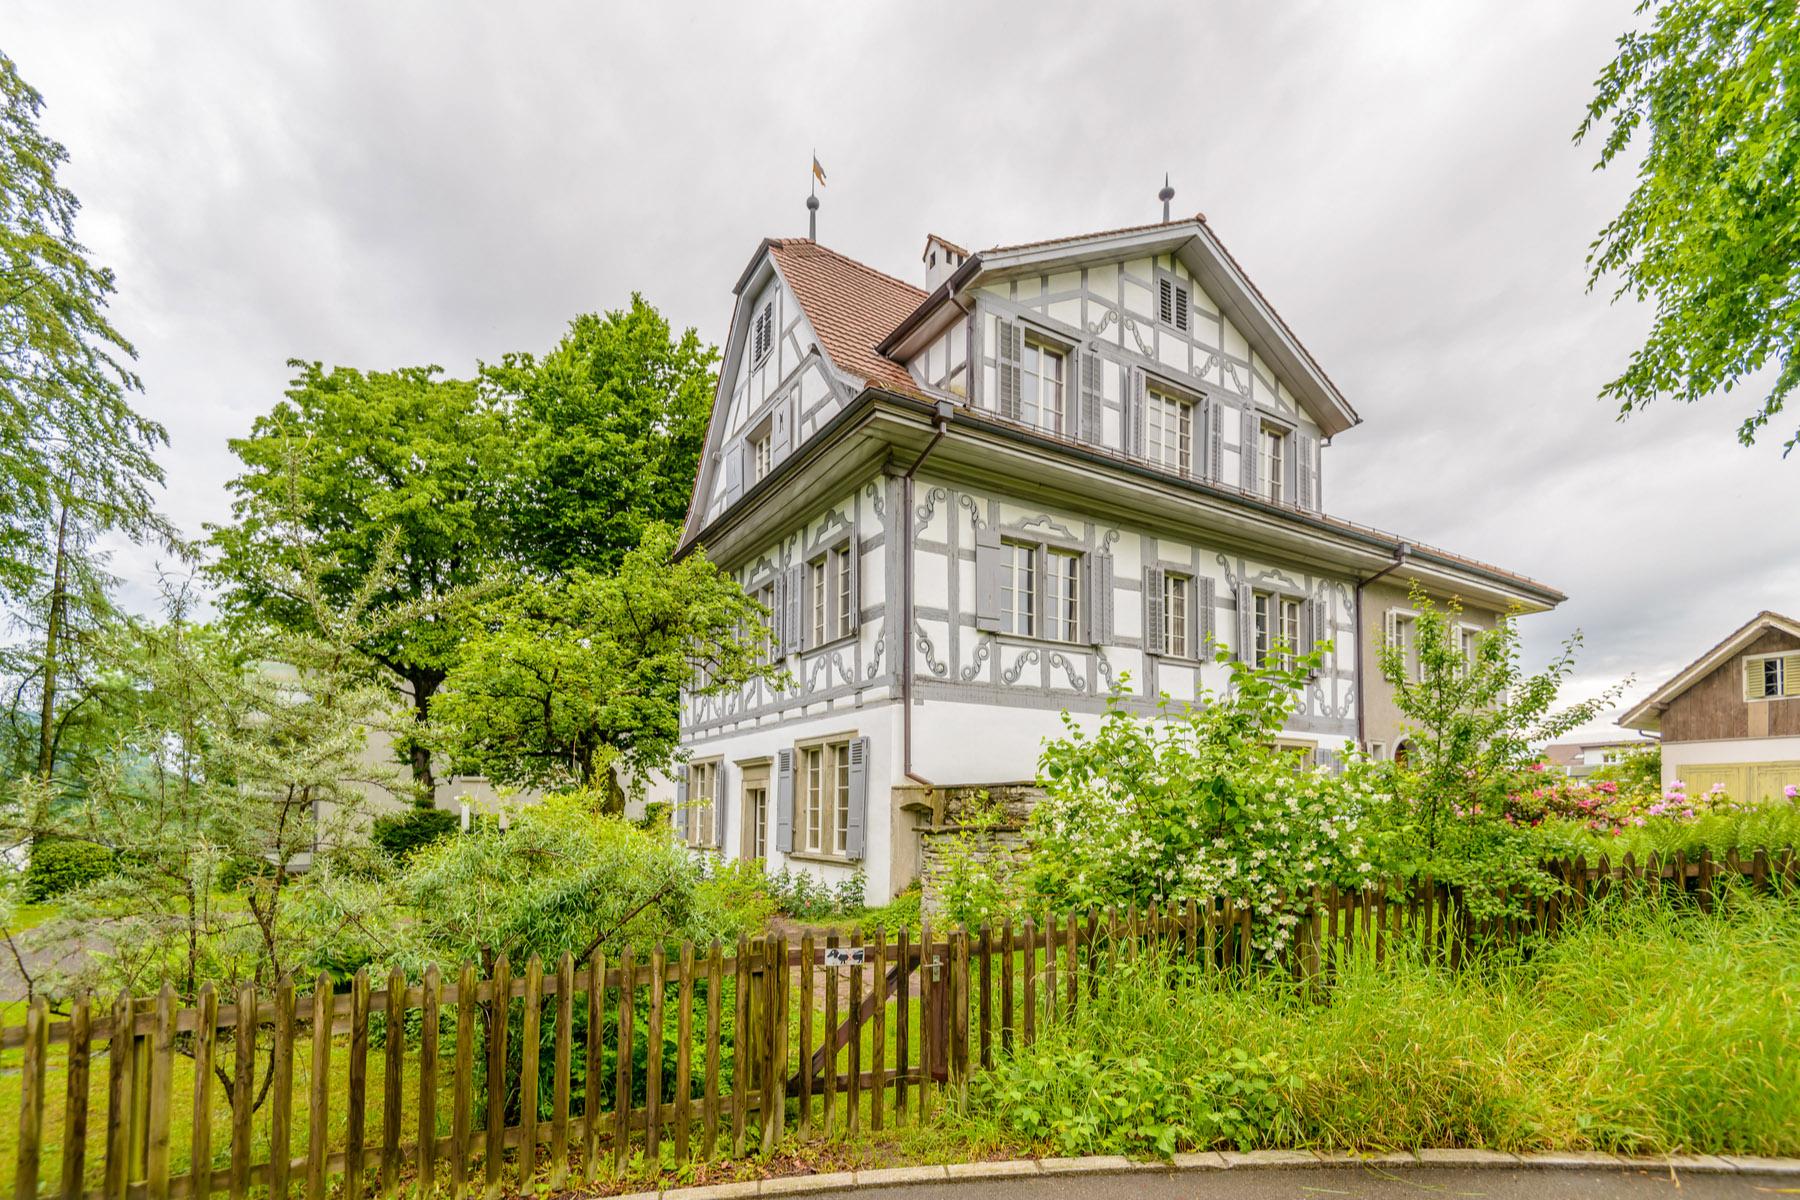 Historic Swiss house